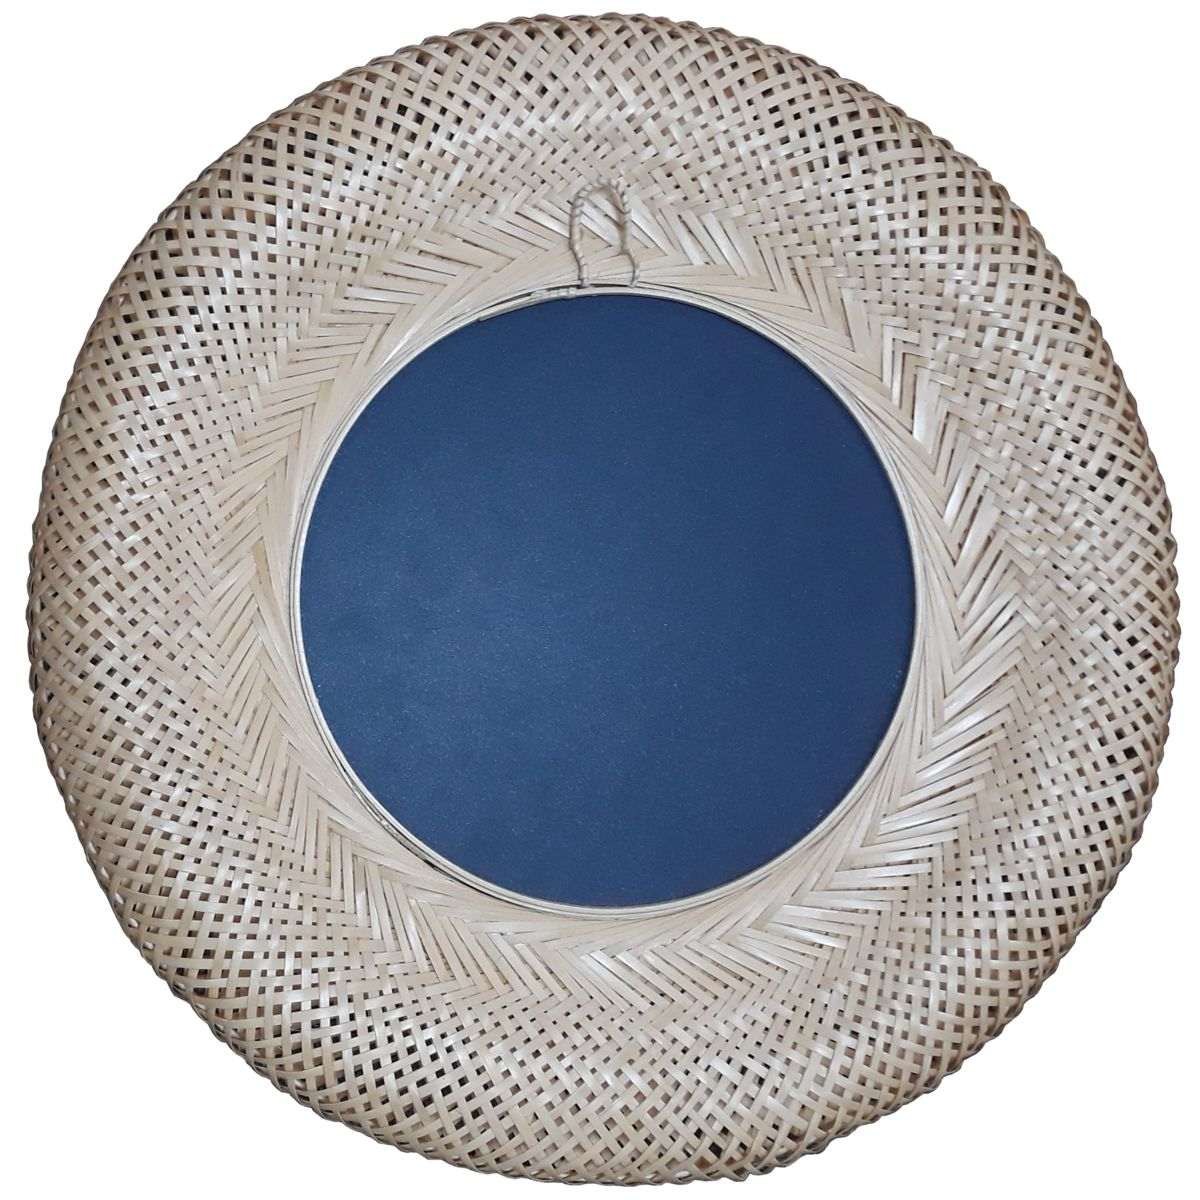 Lustro Okrągłe Utaka Natural śr 55 Cm Inspire